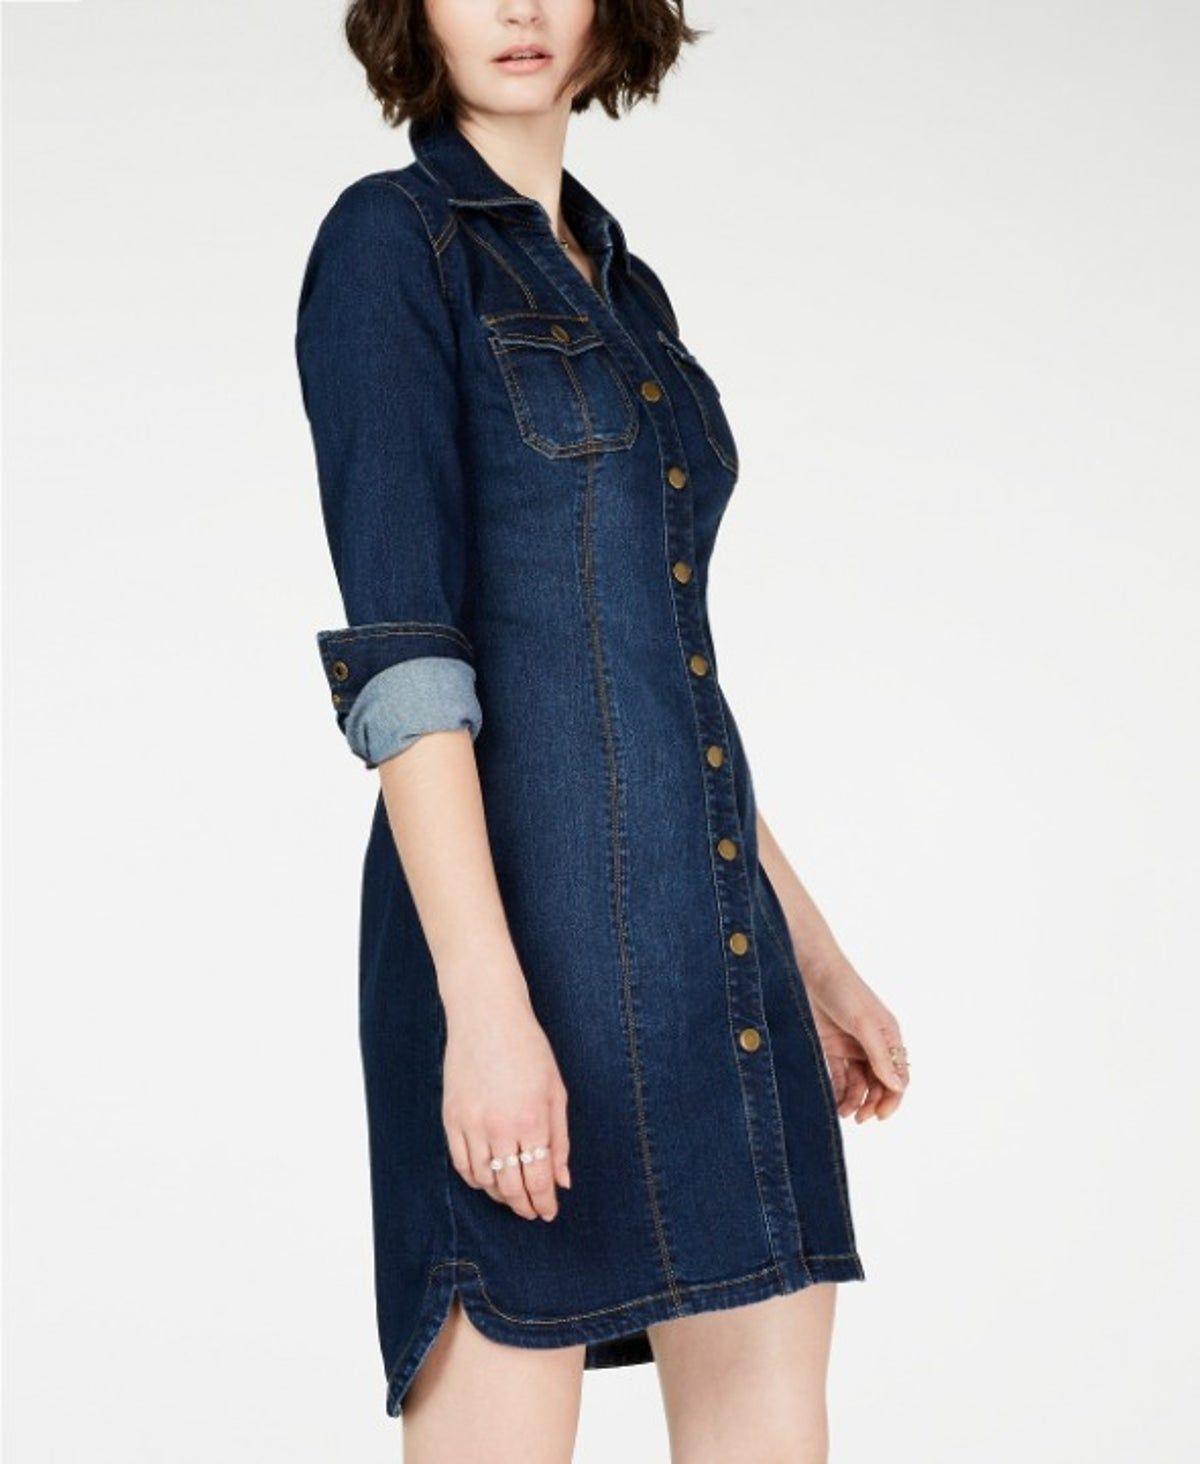 INC Denim Shirtdress 6 on Mercari | Denim shirt dress, Dresses ...